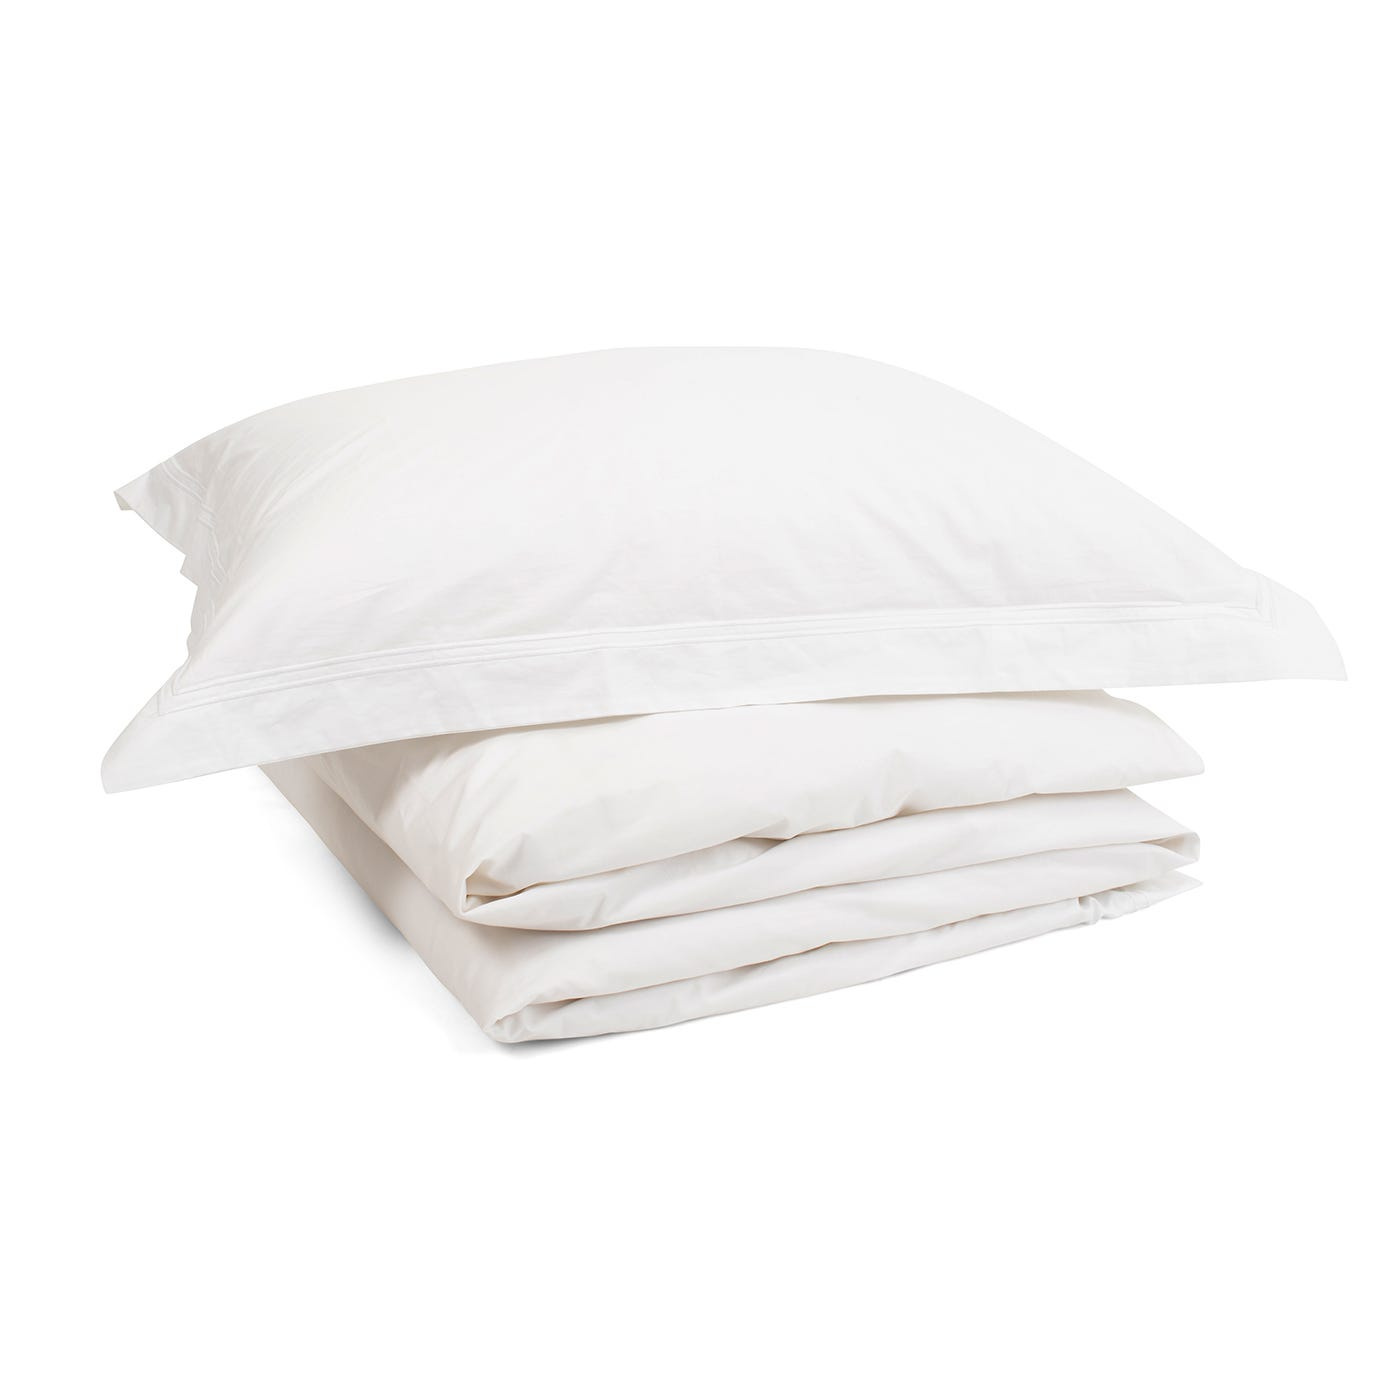 400 Thread Count Egyptian Cotton Kingsize Duvet Cover